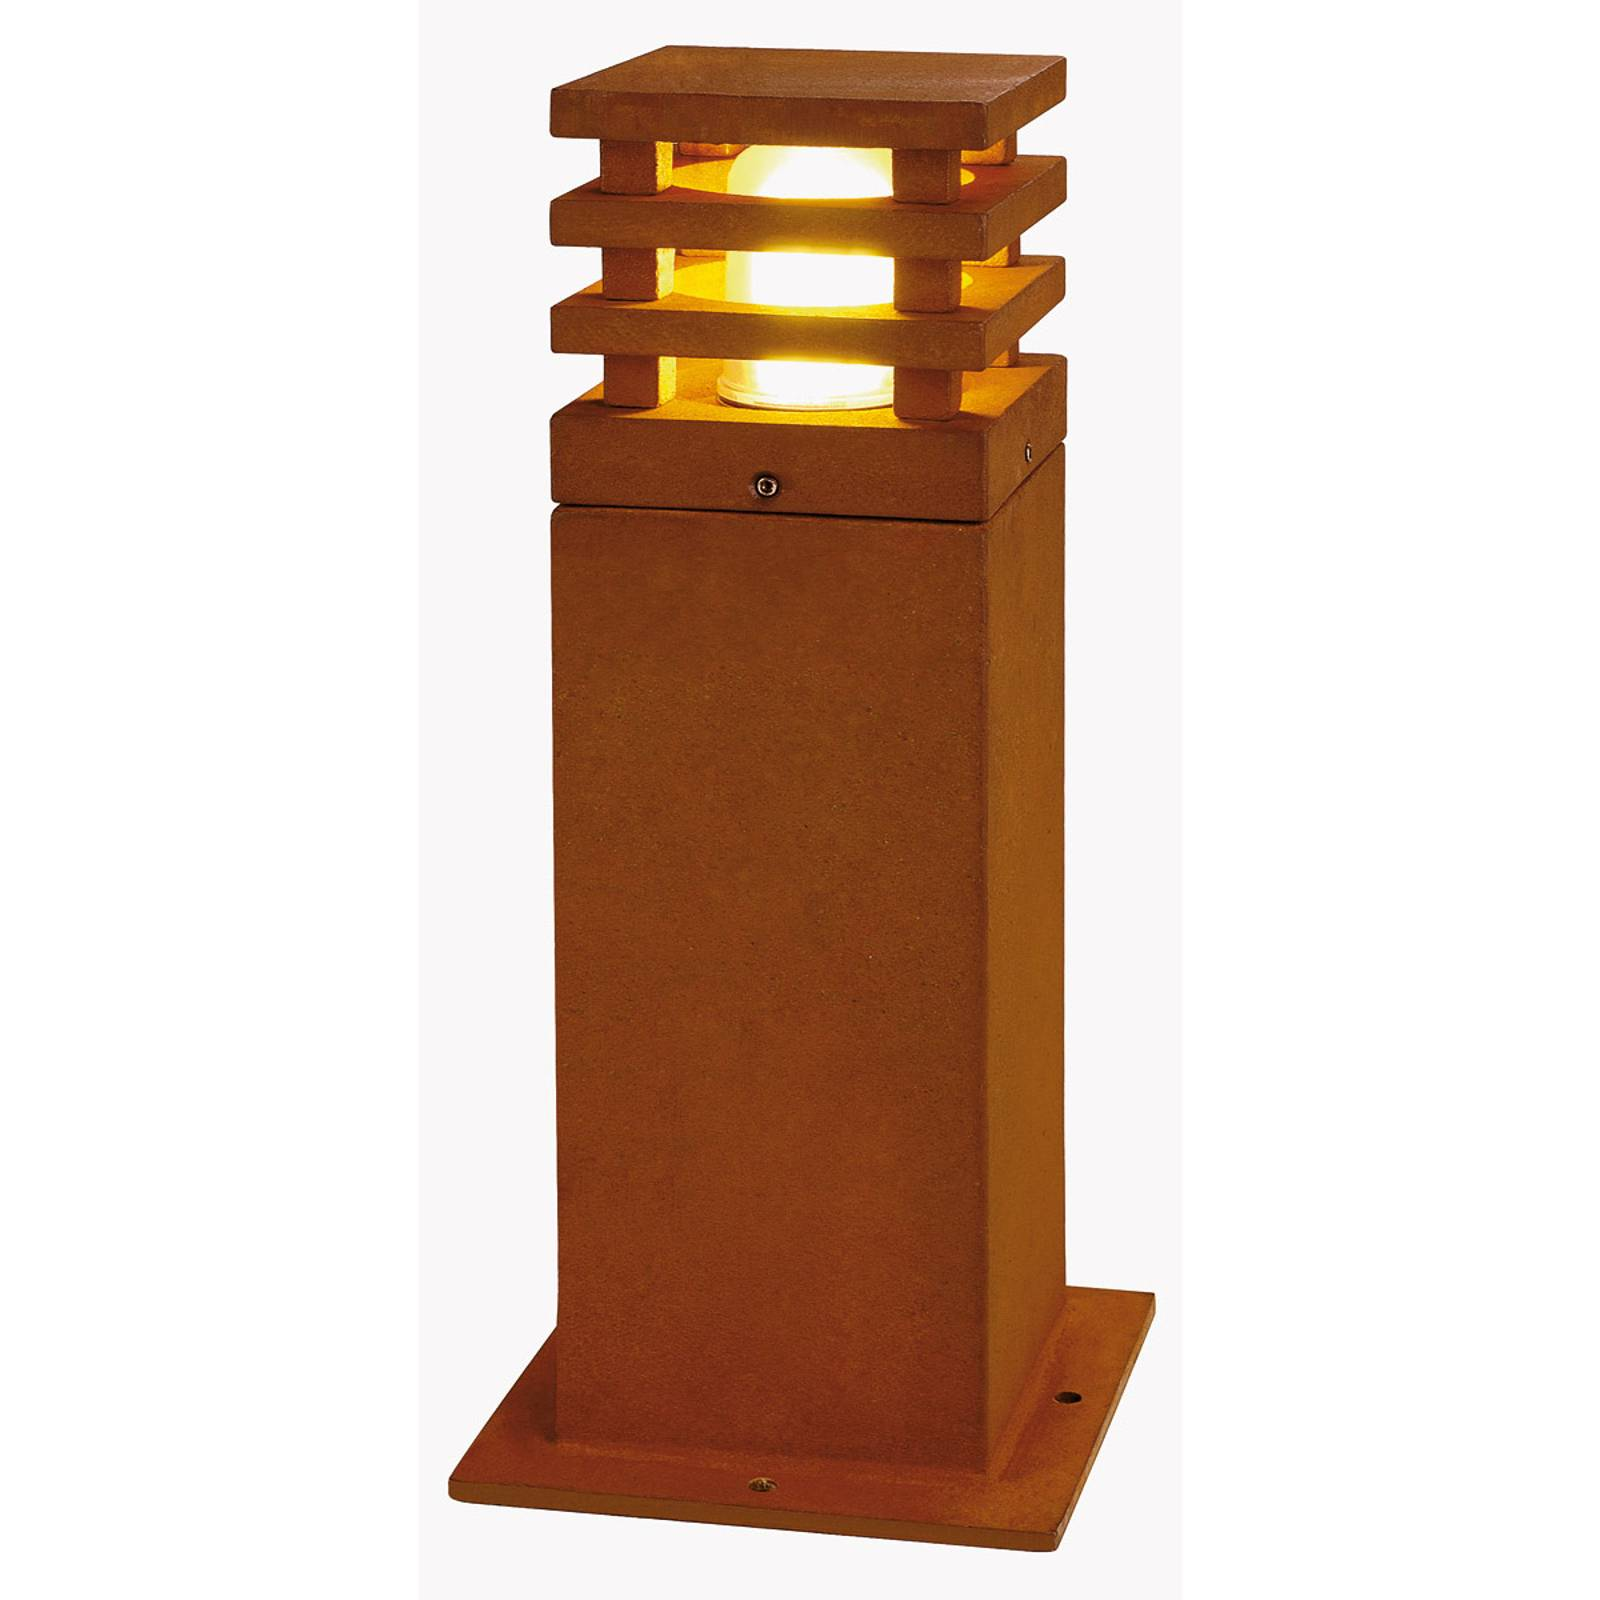 SLV Rusty quadratische LED-Sockelleuchte rostbraun